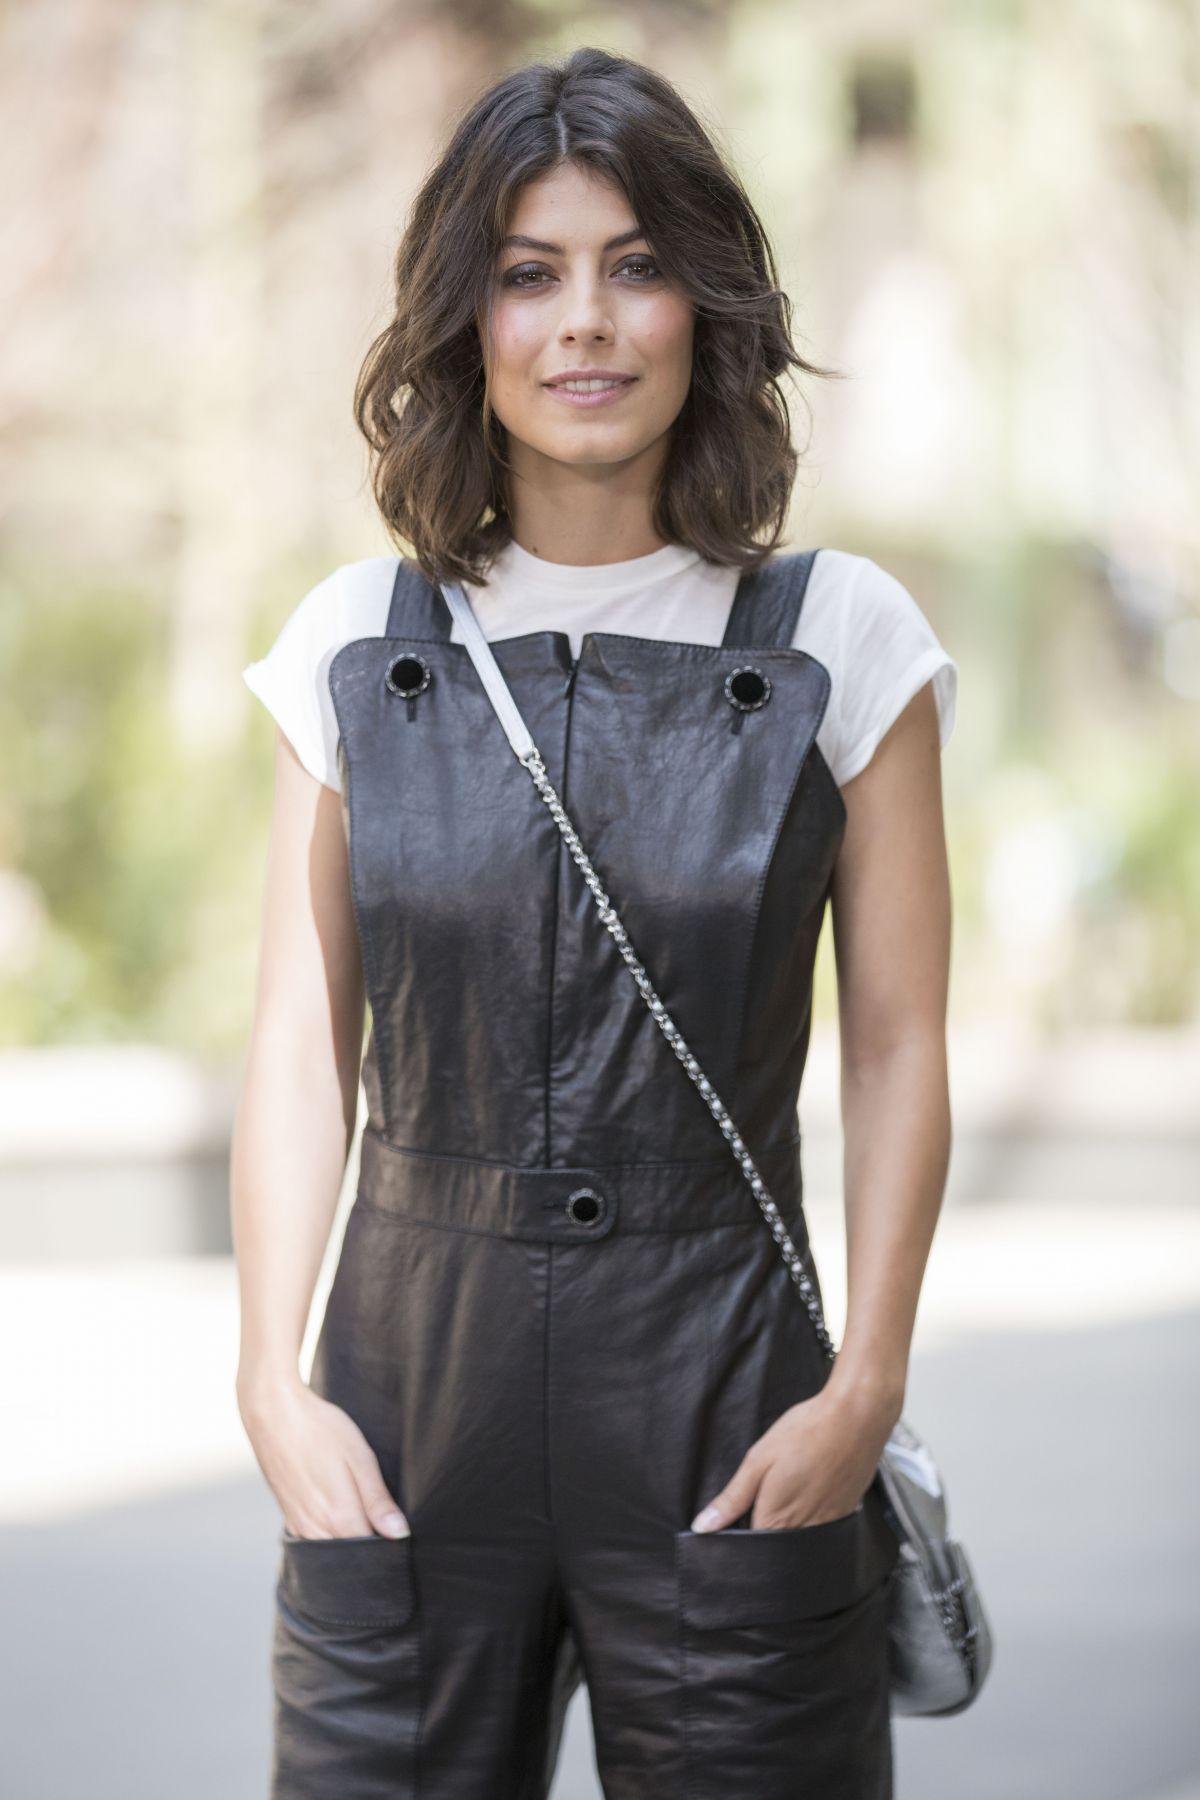 ALESSANDRA MASTRONARDI at Chanel Fashion Show in Paris 07/04/2017